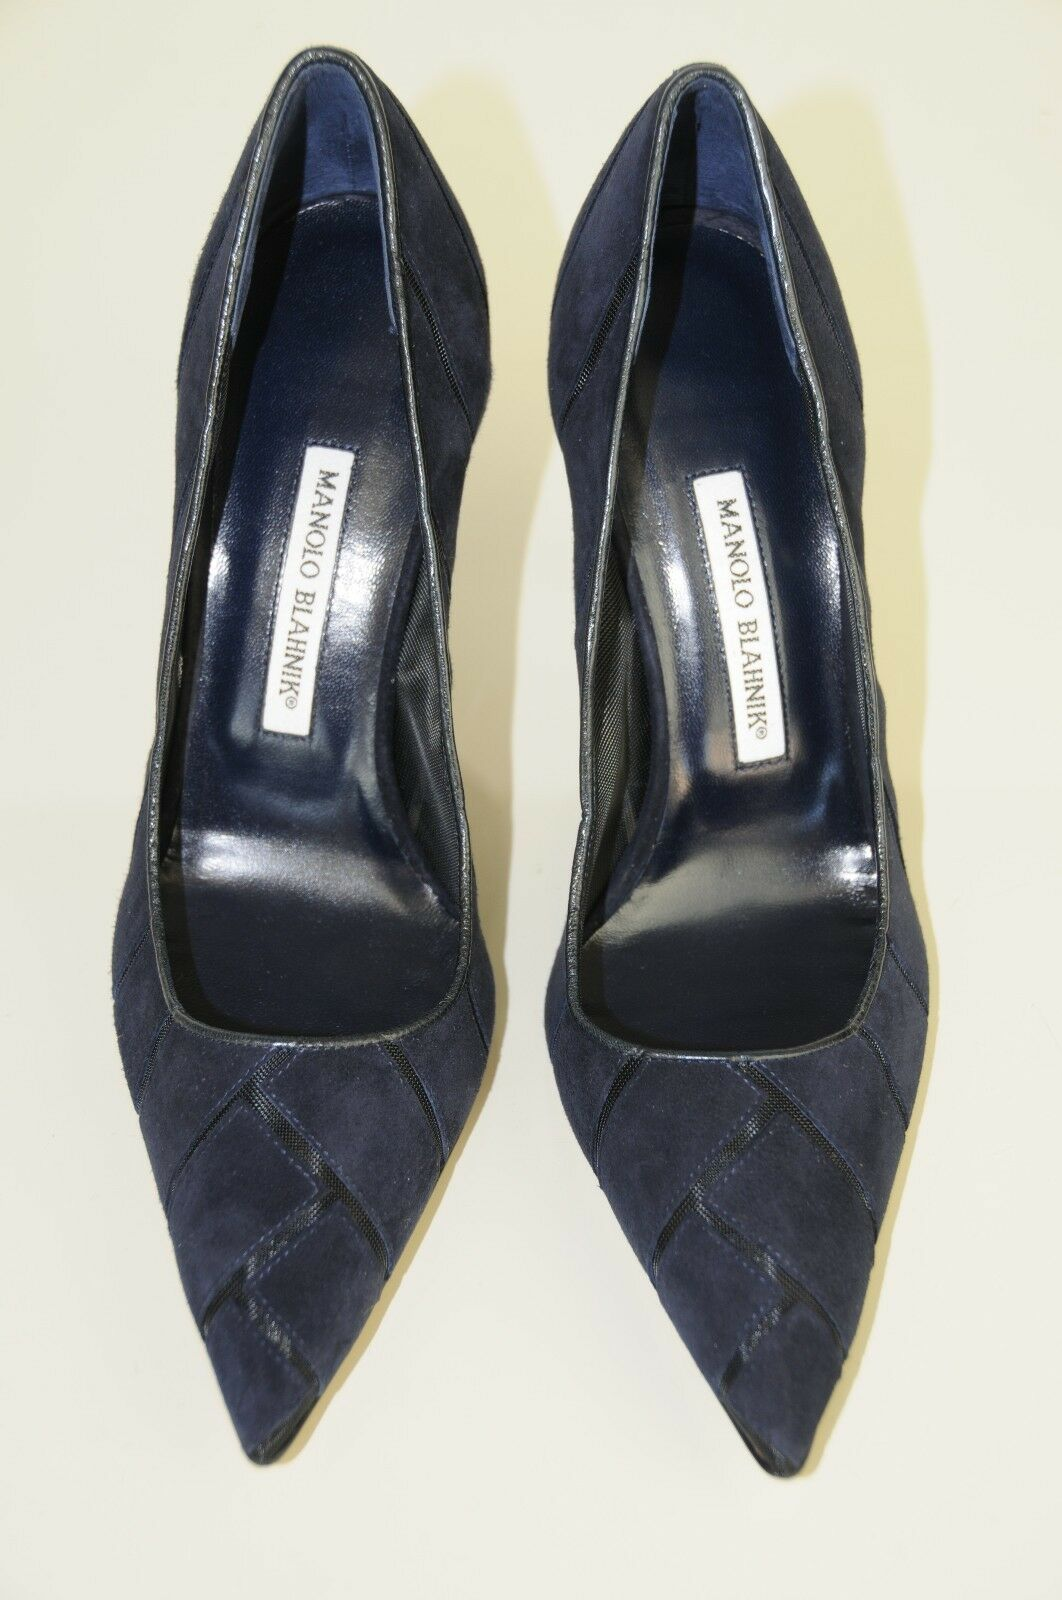 895 New Manolo Blahnik BB Navy bluee bluee bluee Suede Pumps Heels shoes 40 26caec